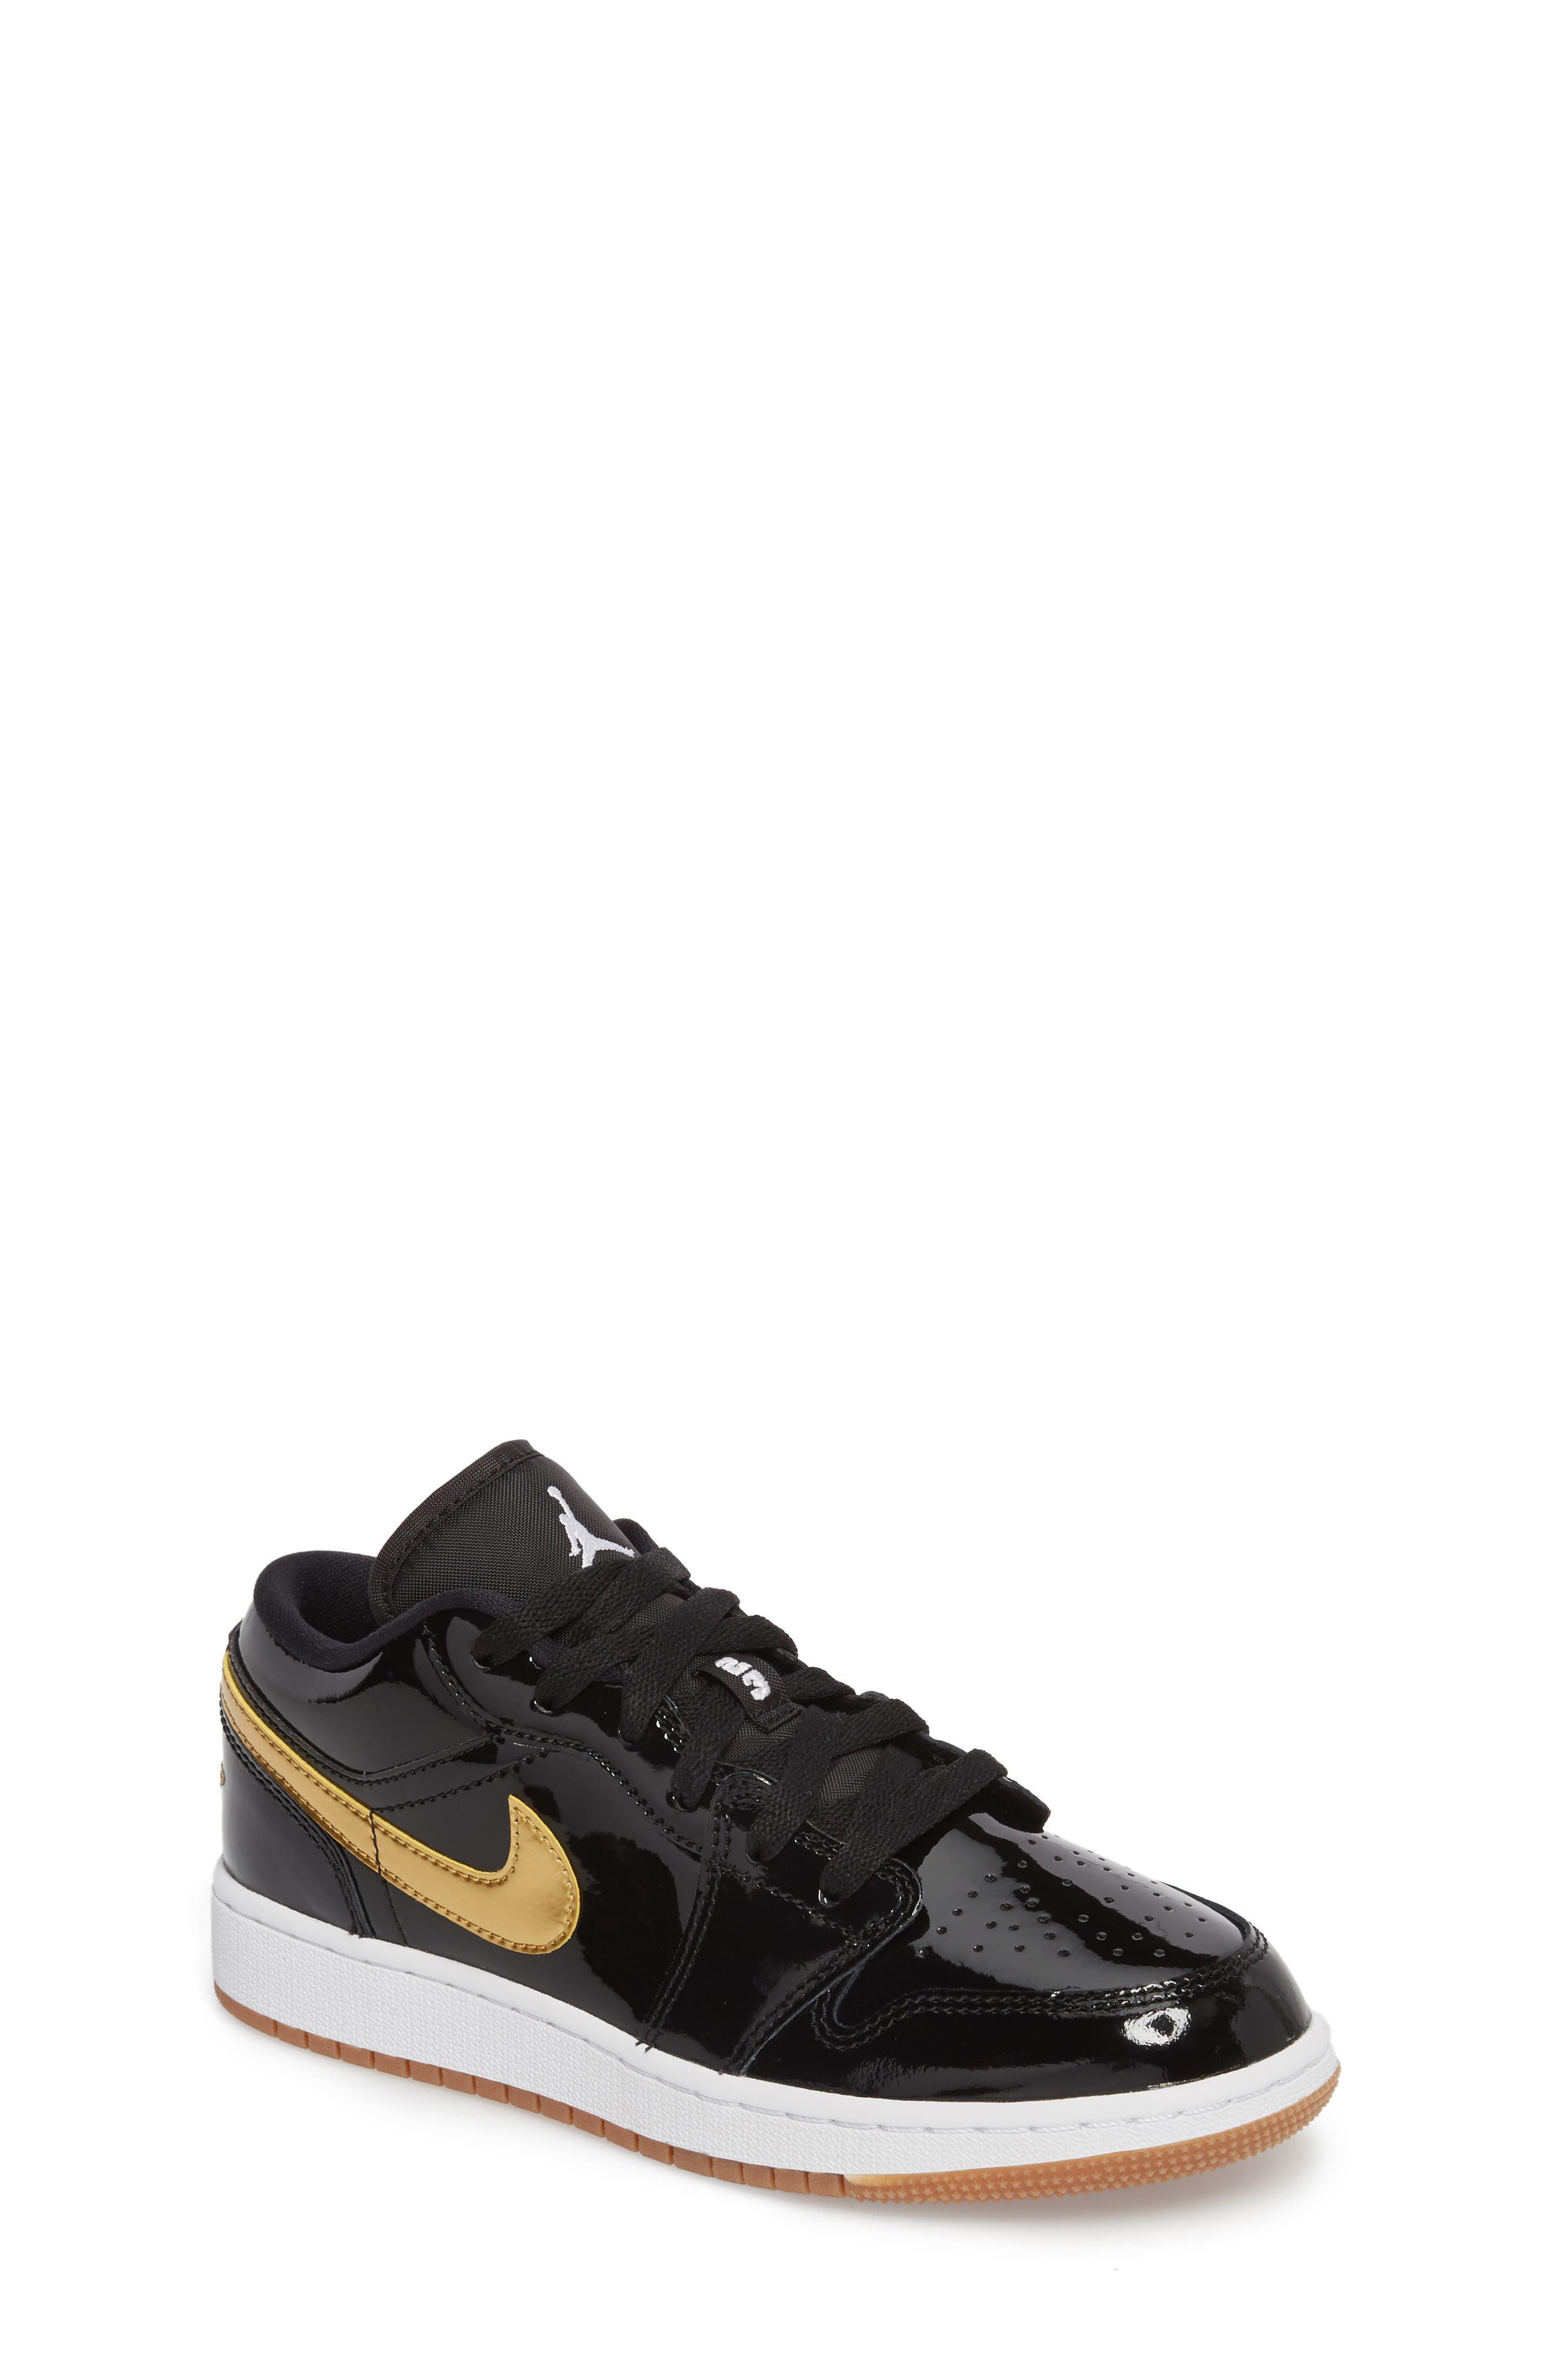 Nike 'Jordan 1 Low' Basketball Shoe,                             Main thumbnail 1, color,                             Black/ Metallic Gold/ White